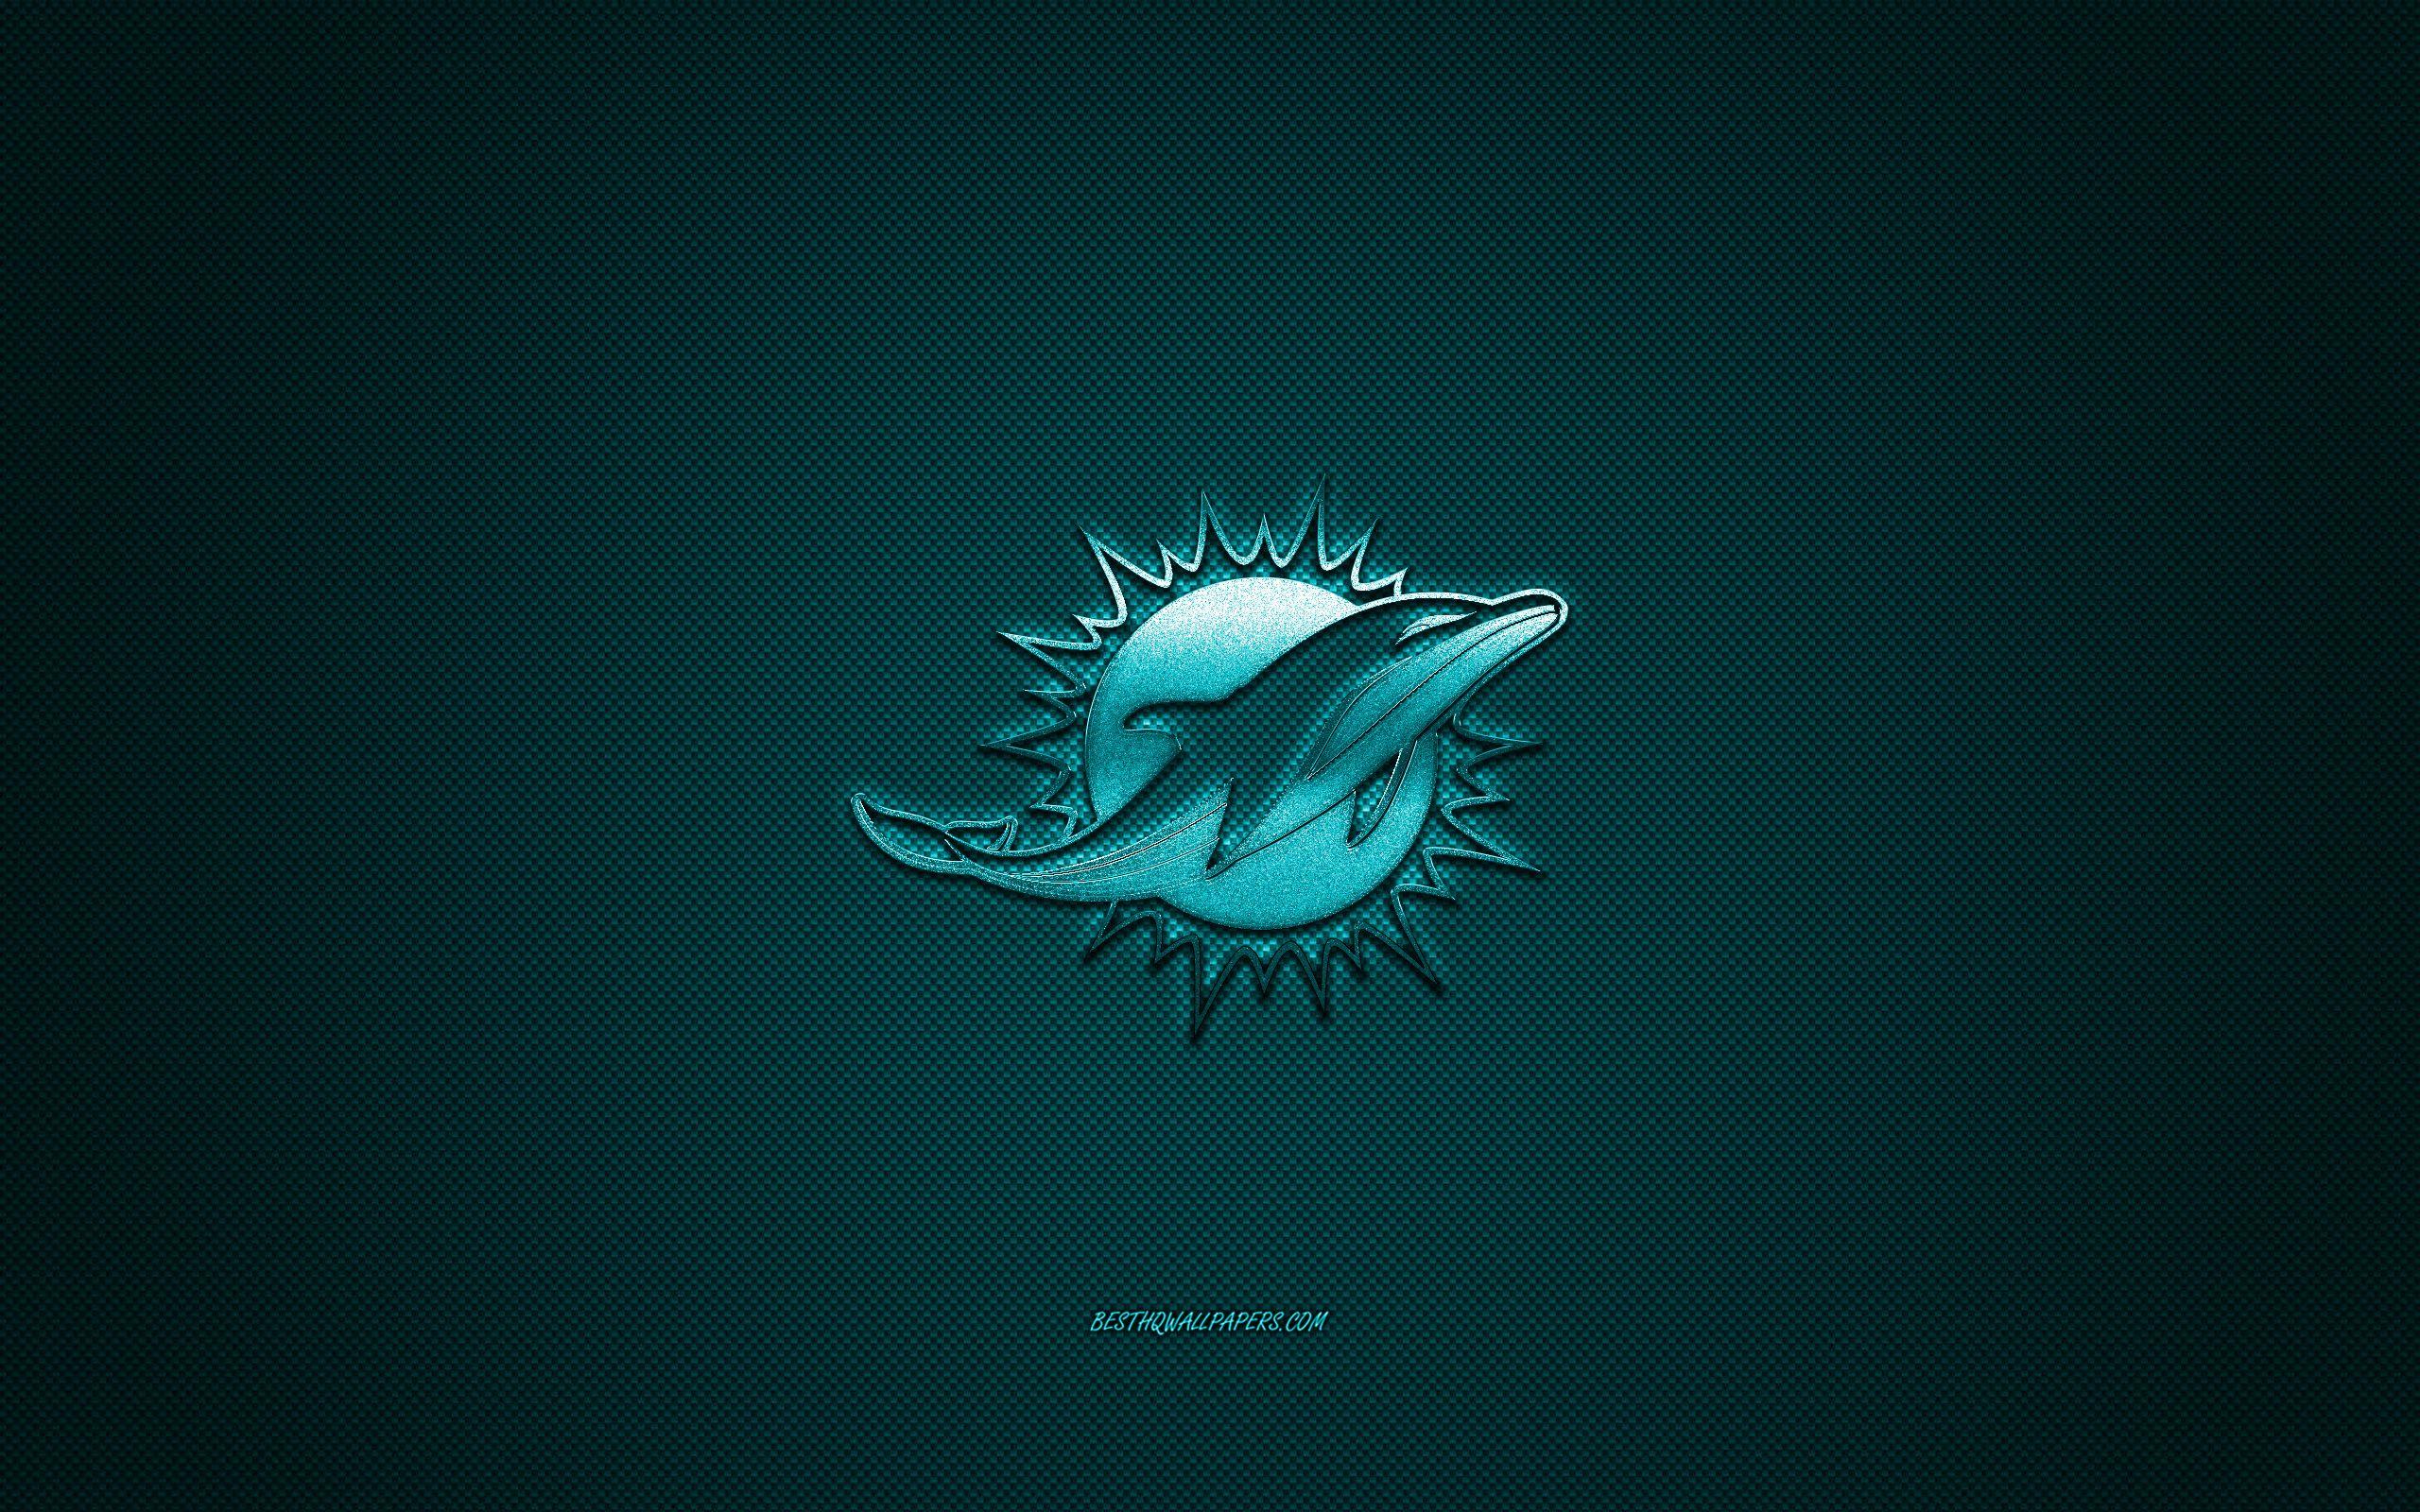 miami dolphins football wallpaper